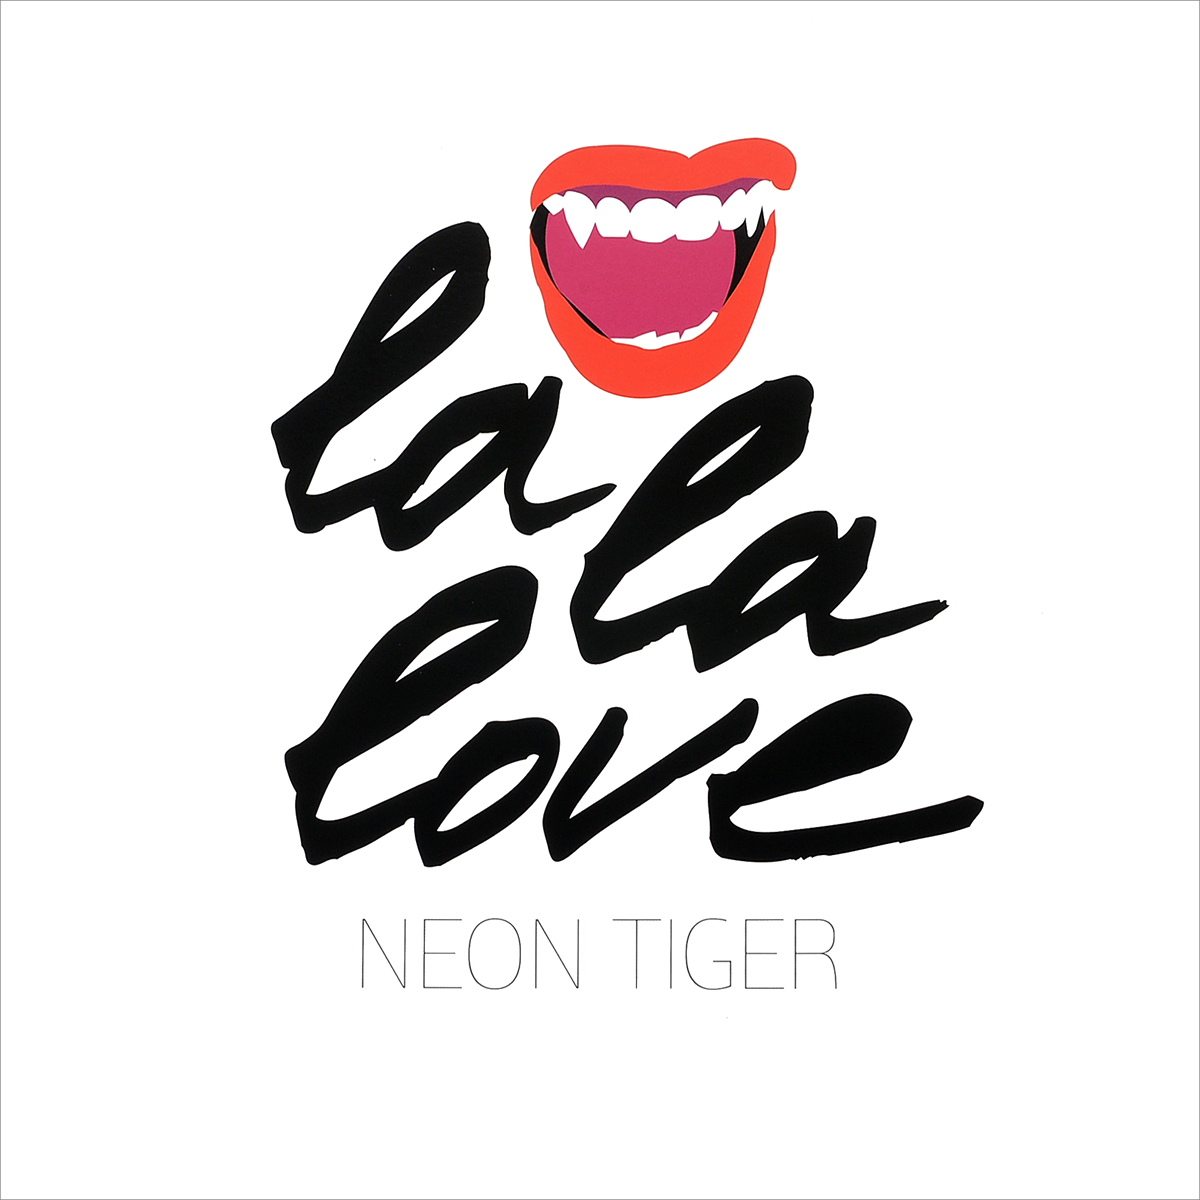 Neon Tiger Neon Tiger. La La Love (LP) 1959 r9 tiger flame standard lp 59 electric guitar free shipping in stock